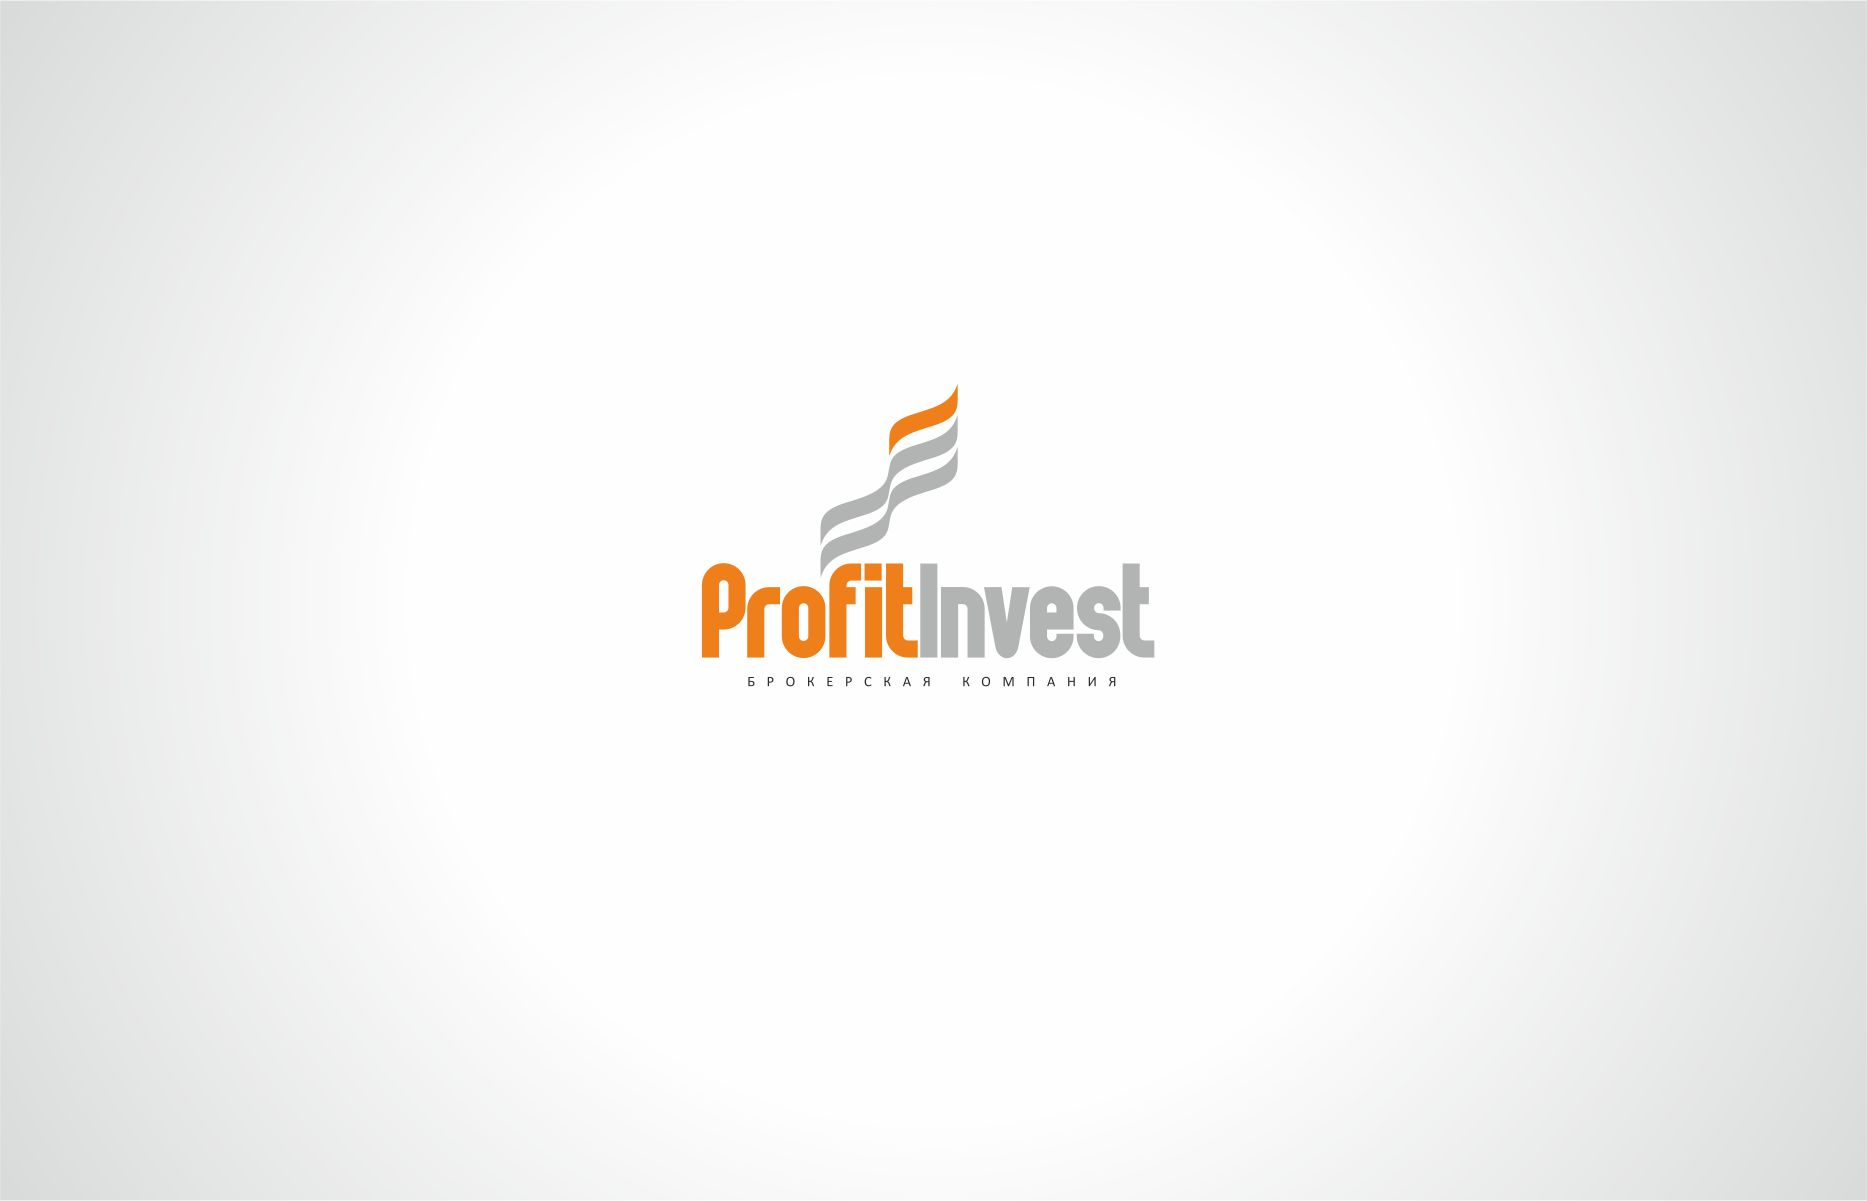 Разработка логотипа для брокерской компании фото f_4f15917cc95a4.jpg